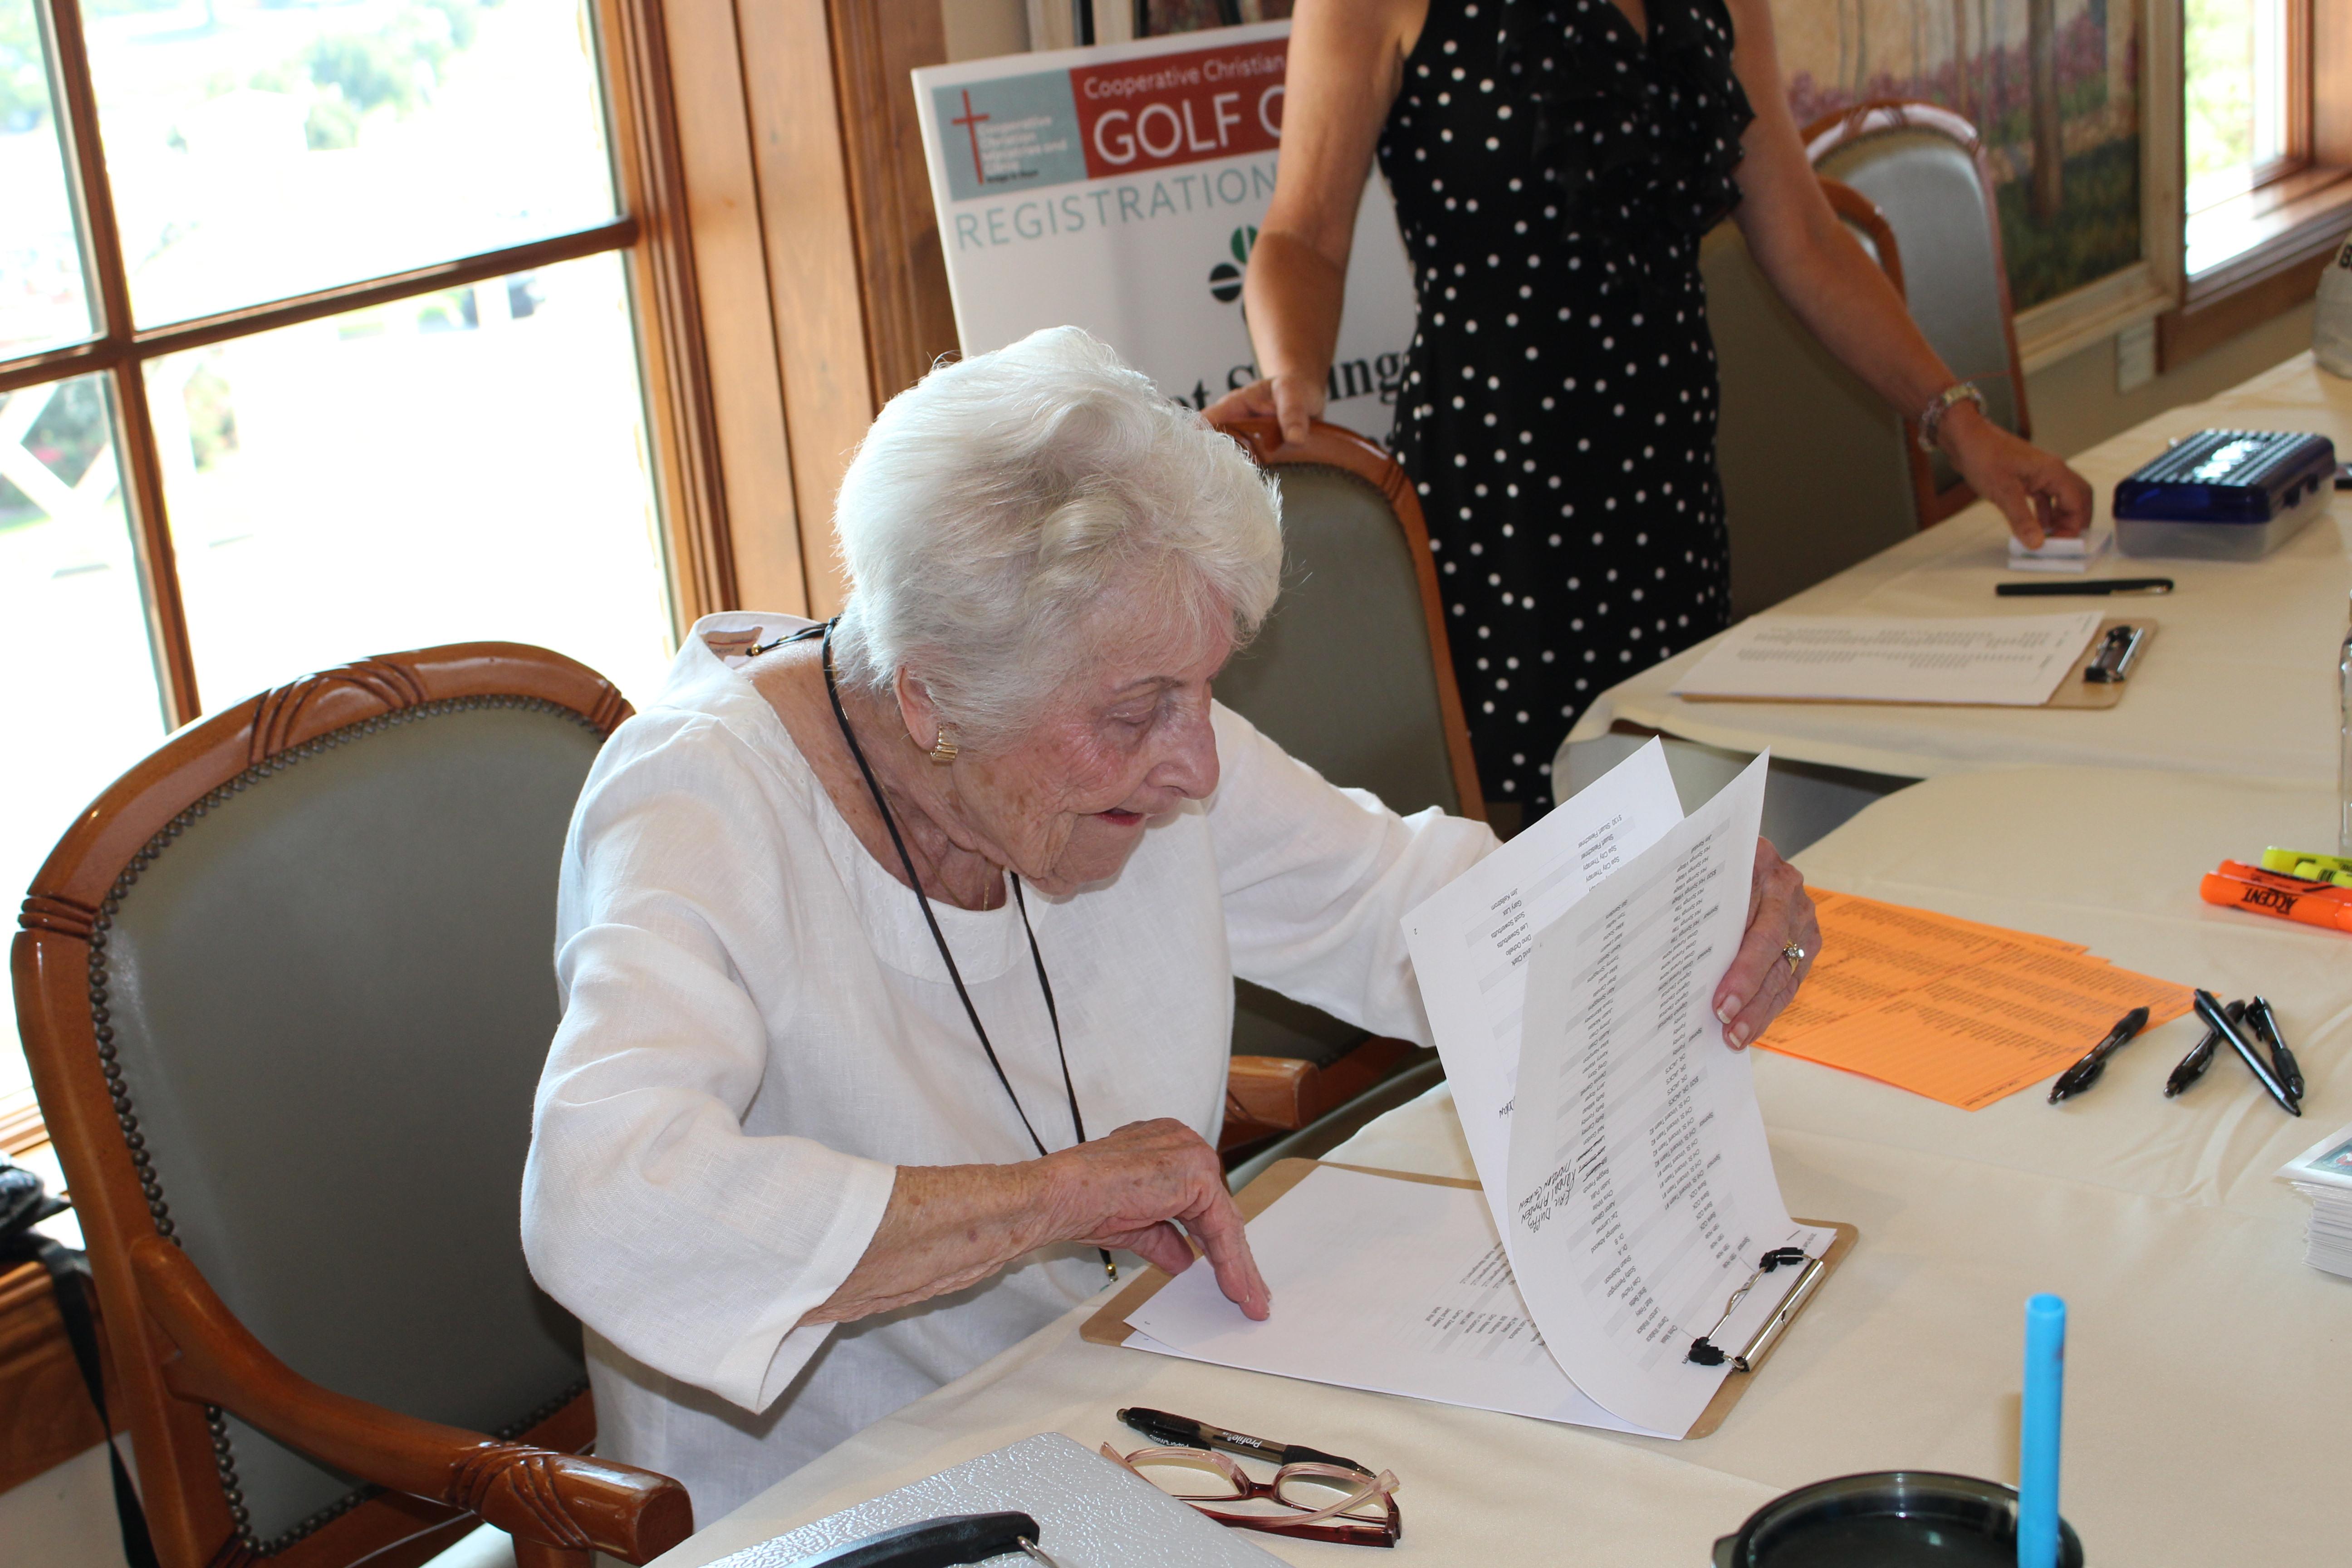 Volunteer Ann Felsted Checks In Golfers